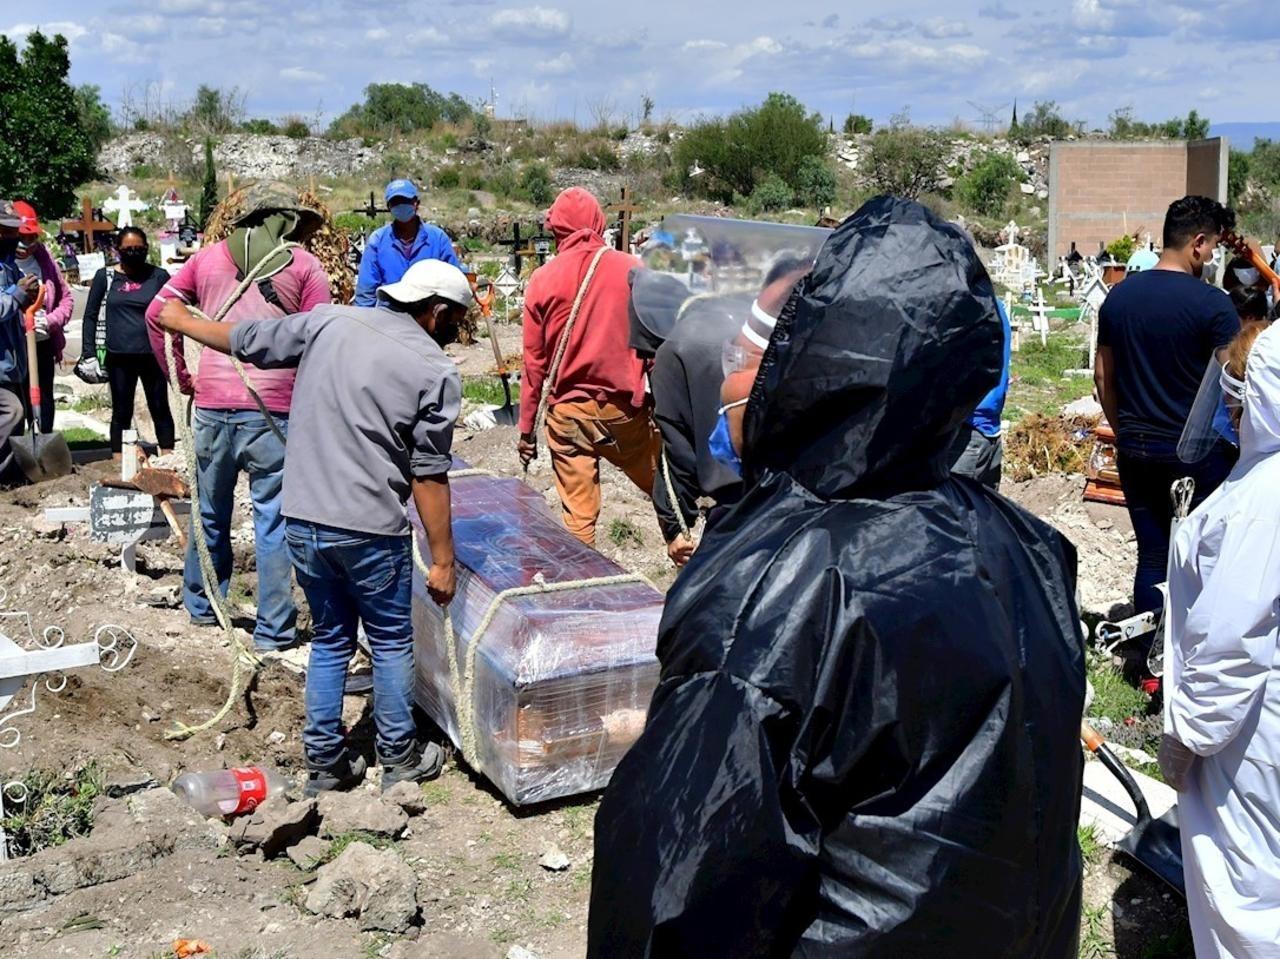 muertos-pandemia-covid-escenario-tlaxcala-data-civica.j